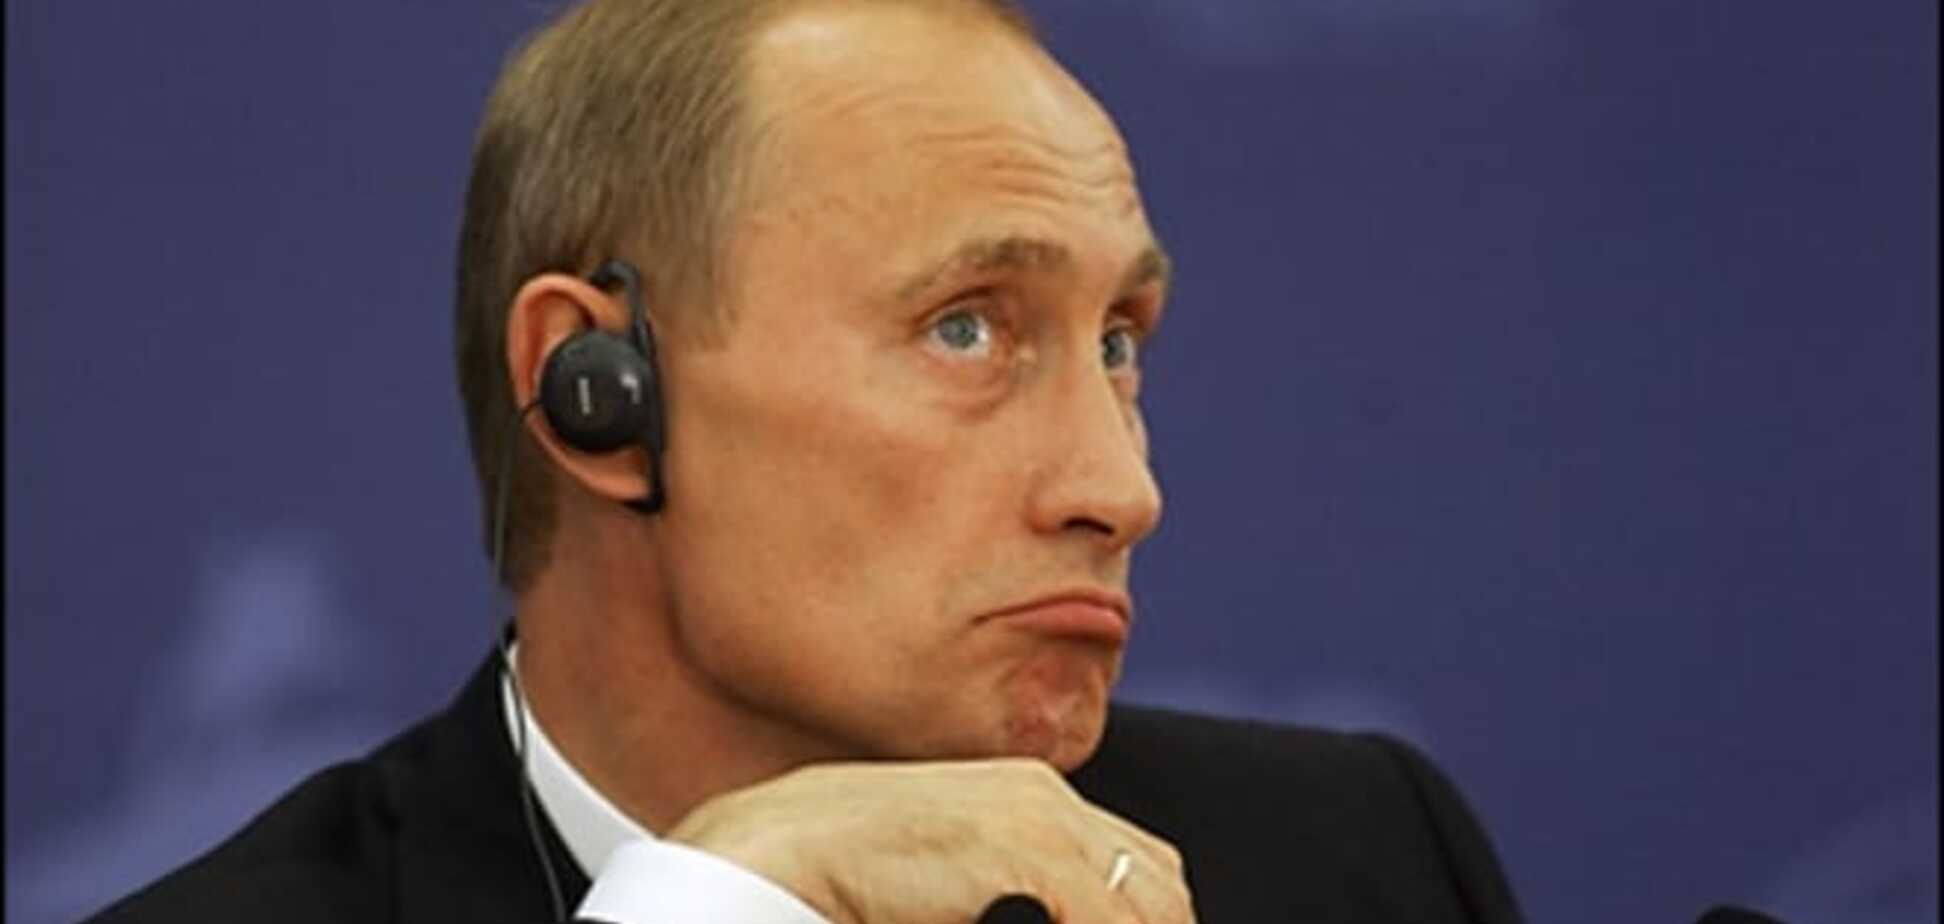 'Мы за Вову, Вова клевый'. Шутка про Путина взорвала соцсети